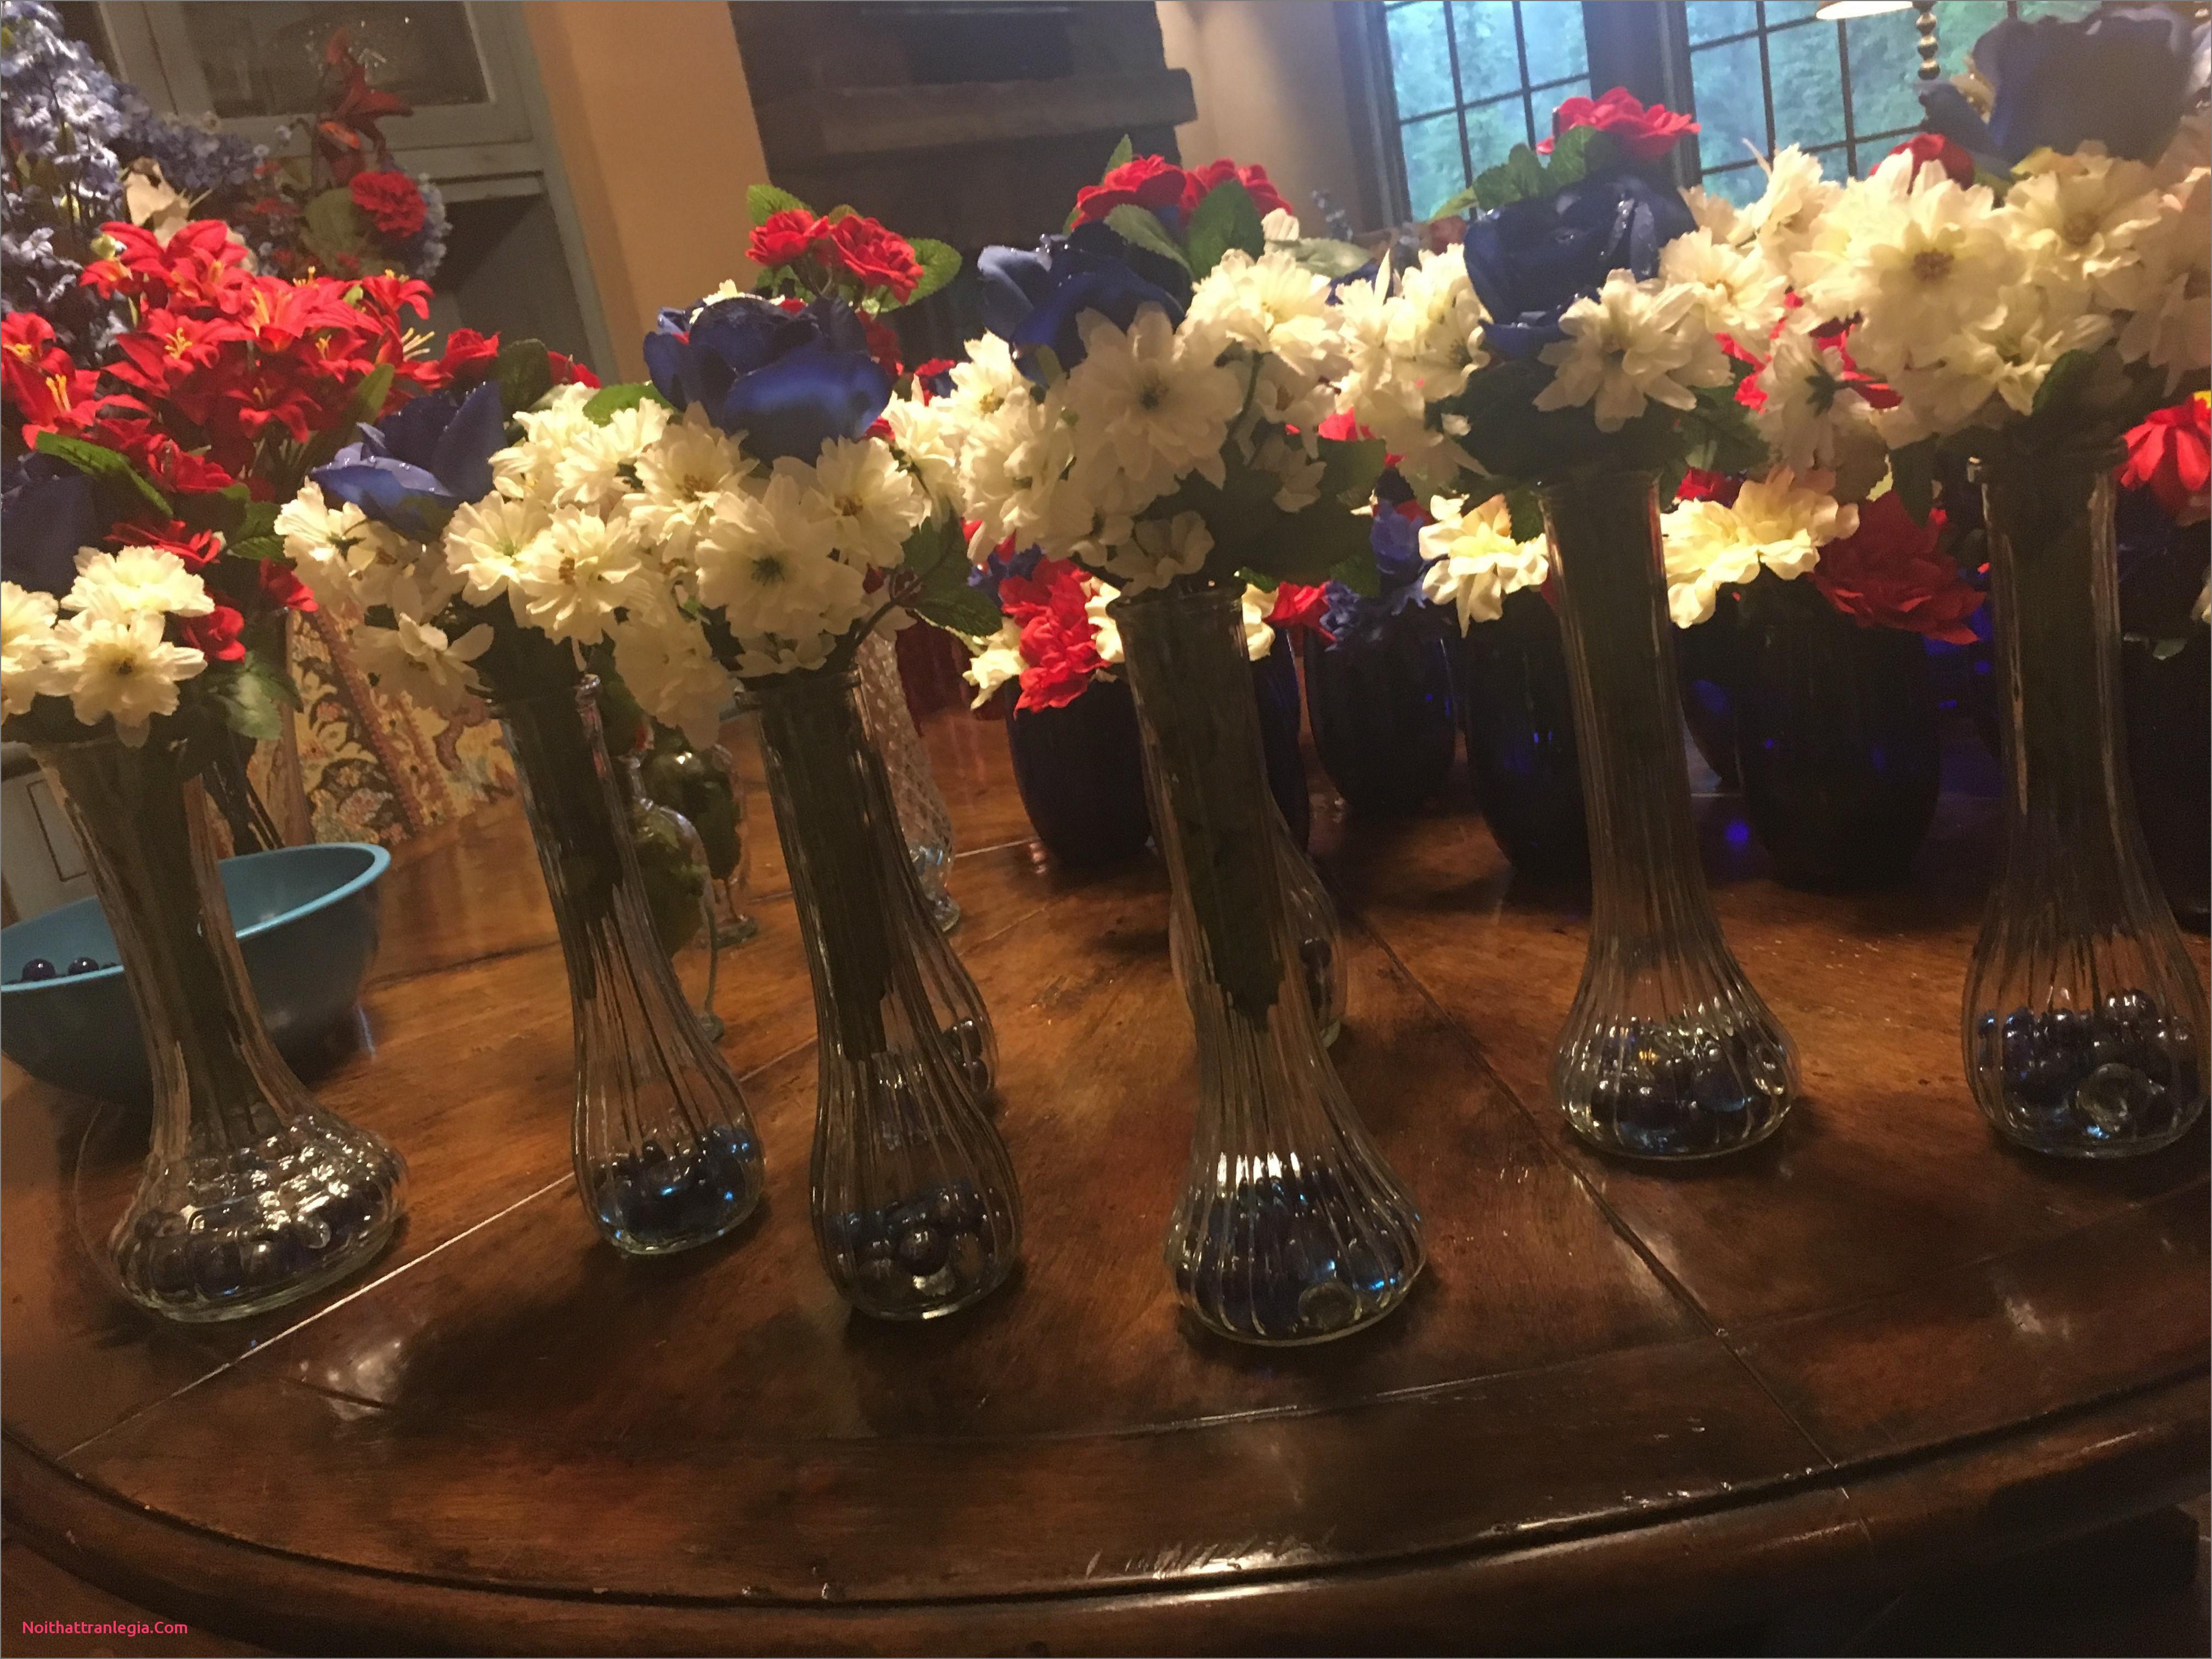 cheap large vases for sale of 20 how to clean flower vases noithattranlegia vases design in diy wedding decoration ideas inspirational dollar tree wedding decorations awesome h vases dollar vase i 0d